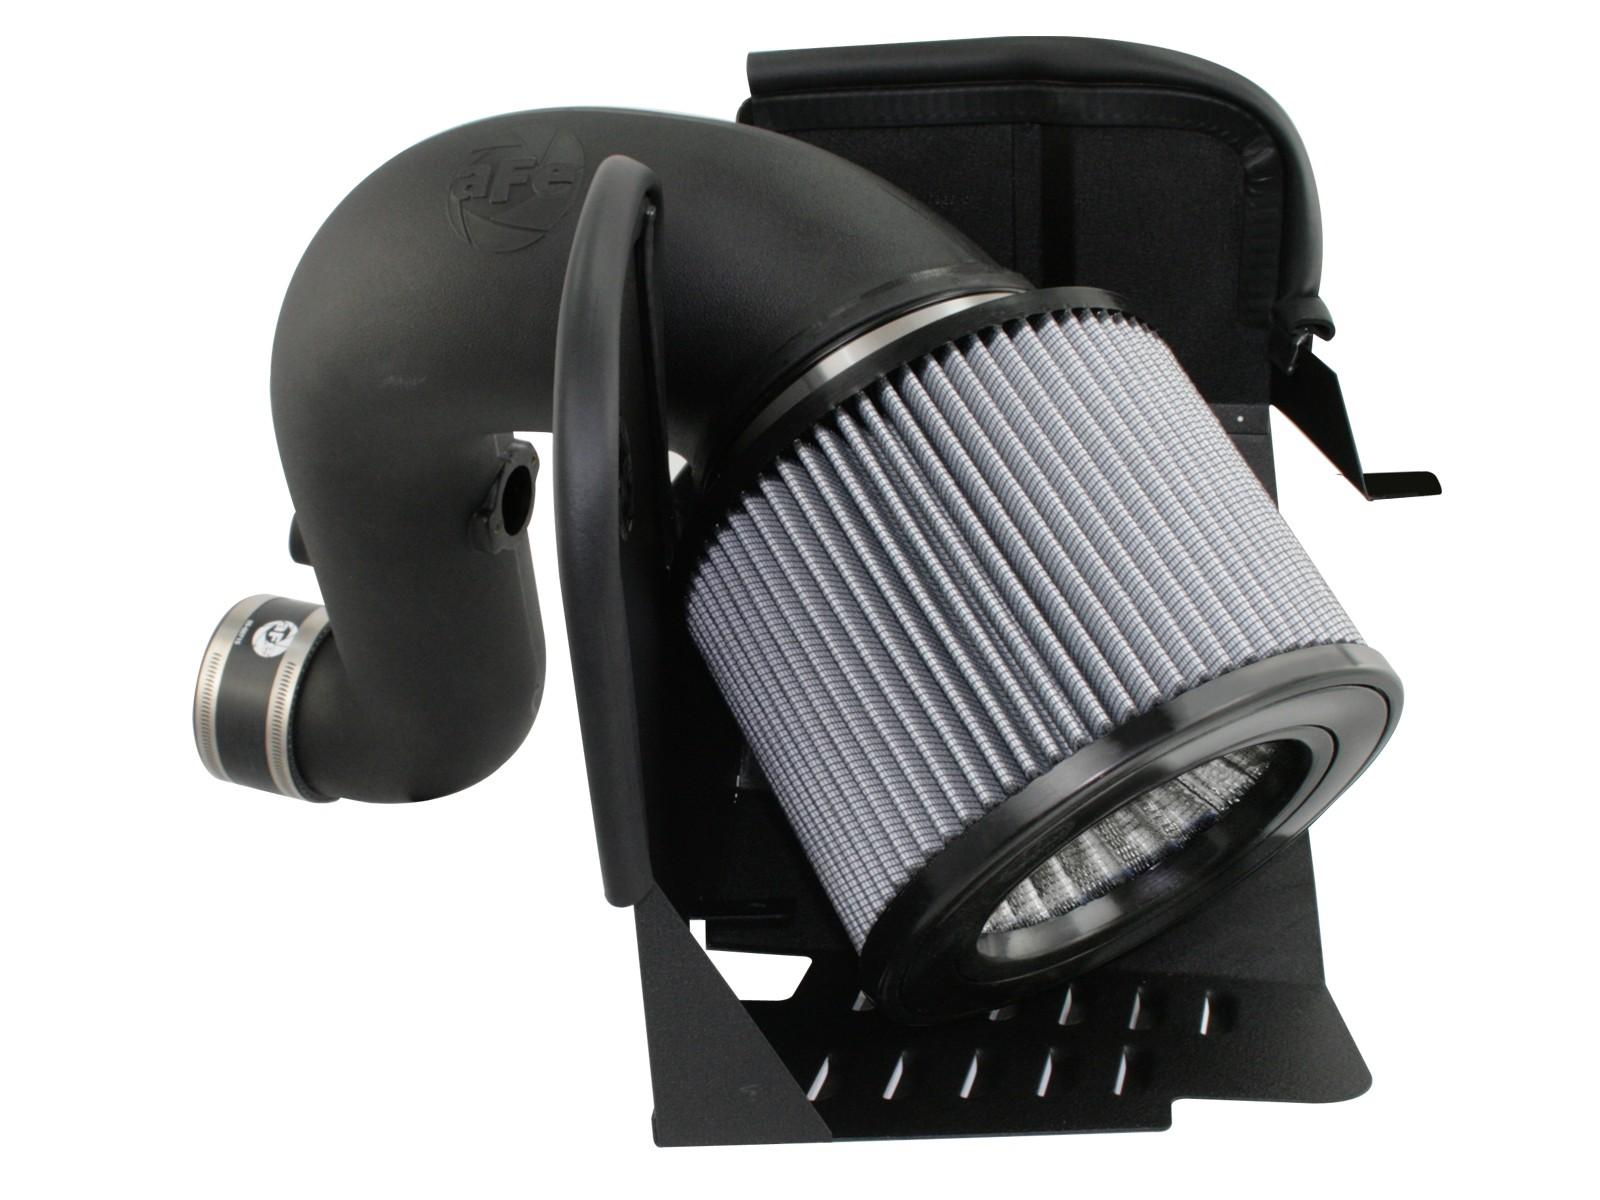 aFe Pro Dry S STAGE 2 Cold Air Intake for 07.5-12 DODGE RAM 6.7L Cummins Diesel